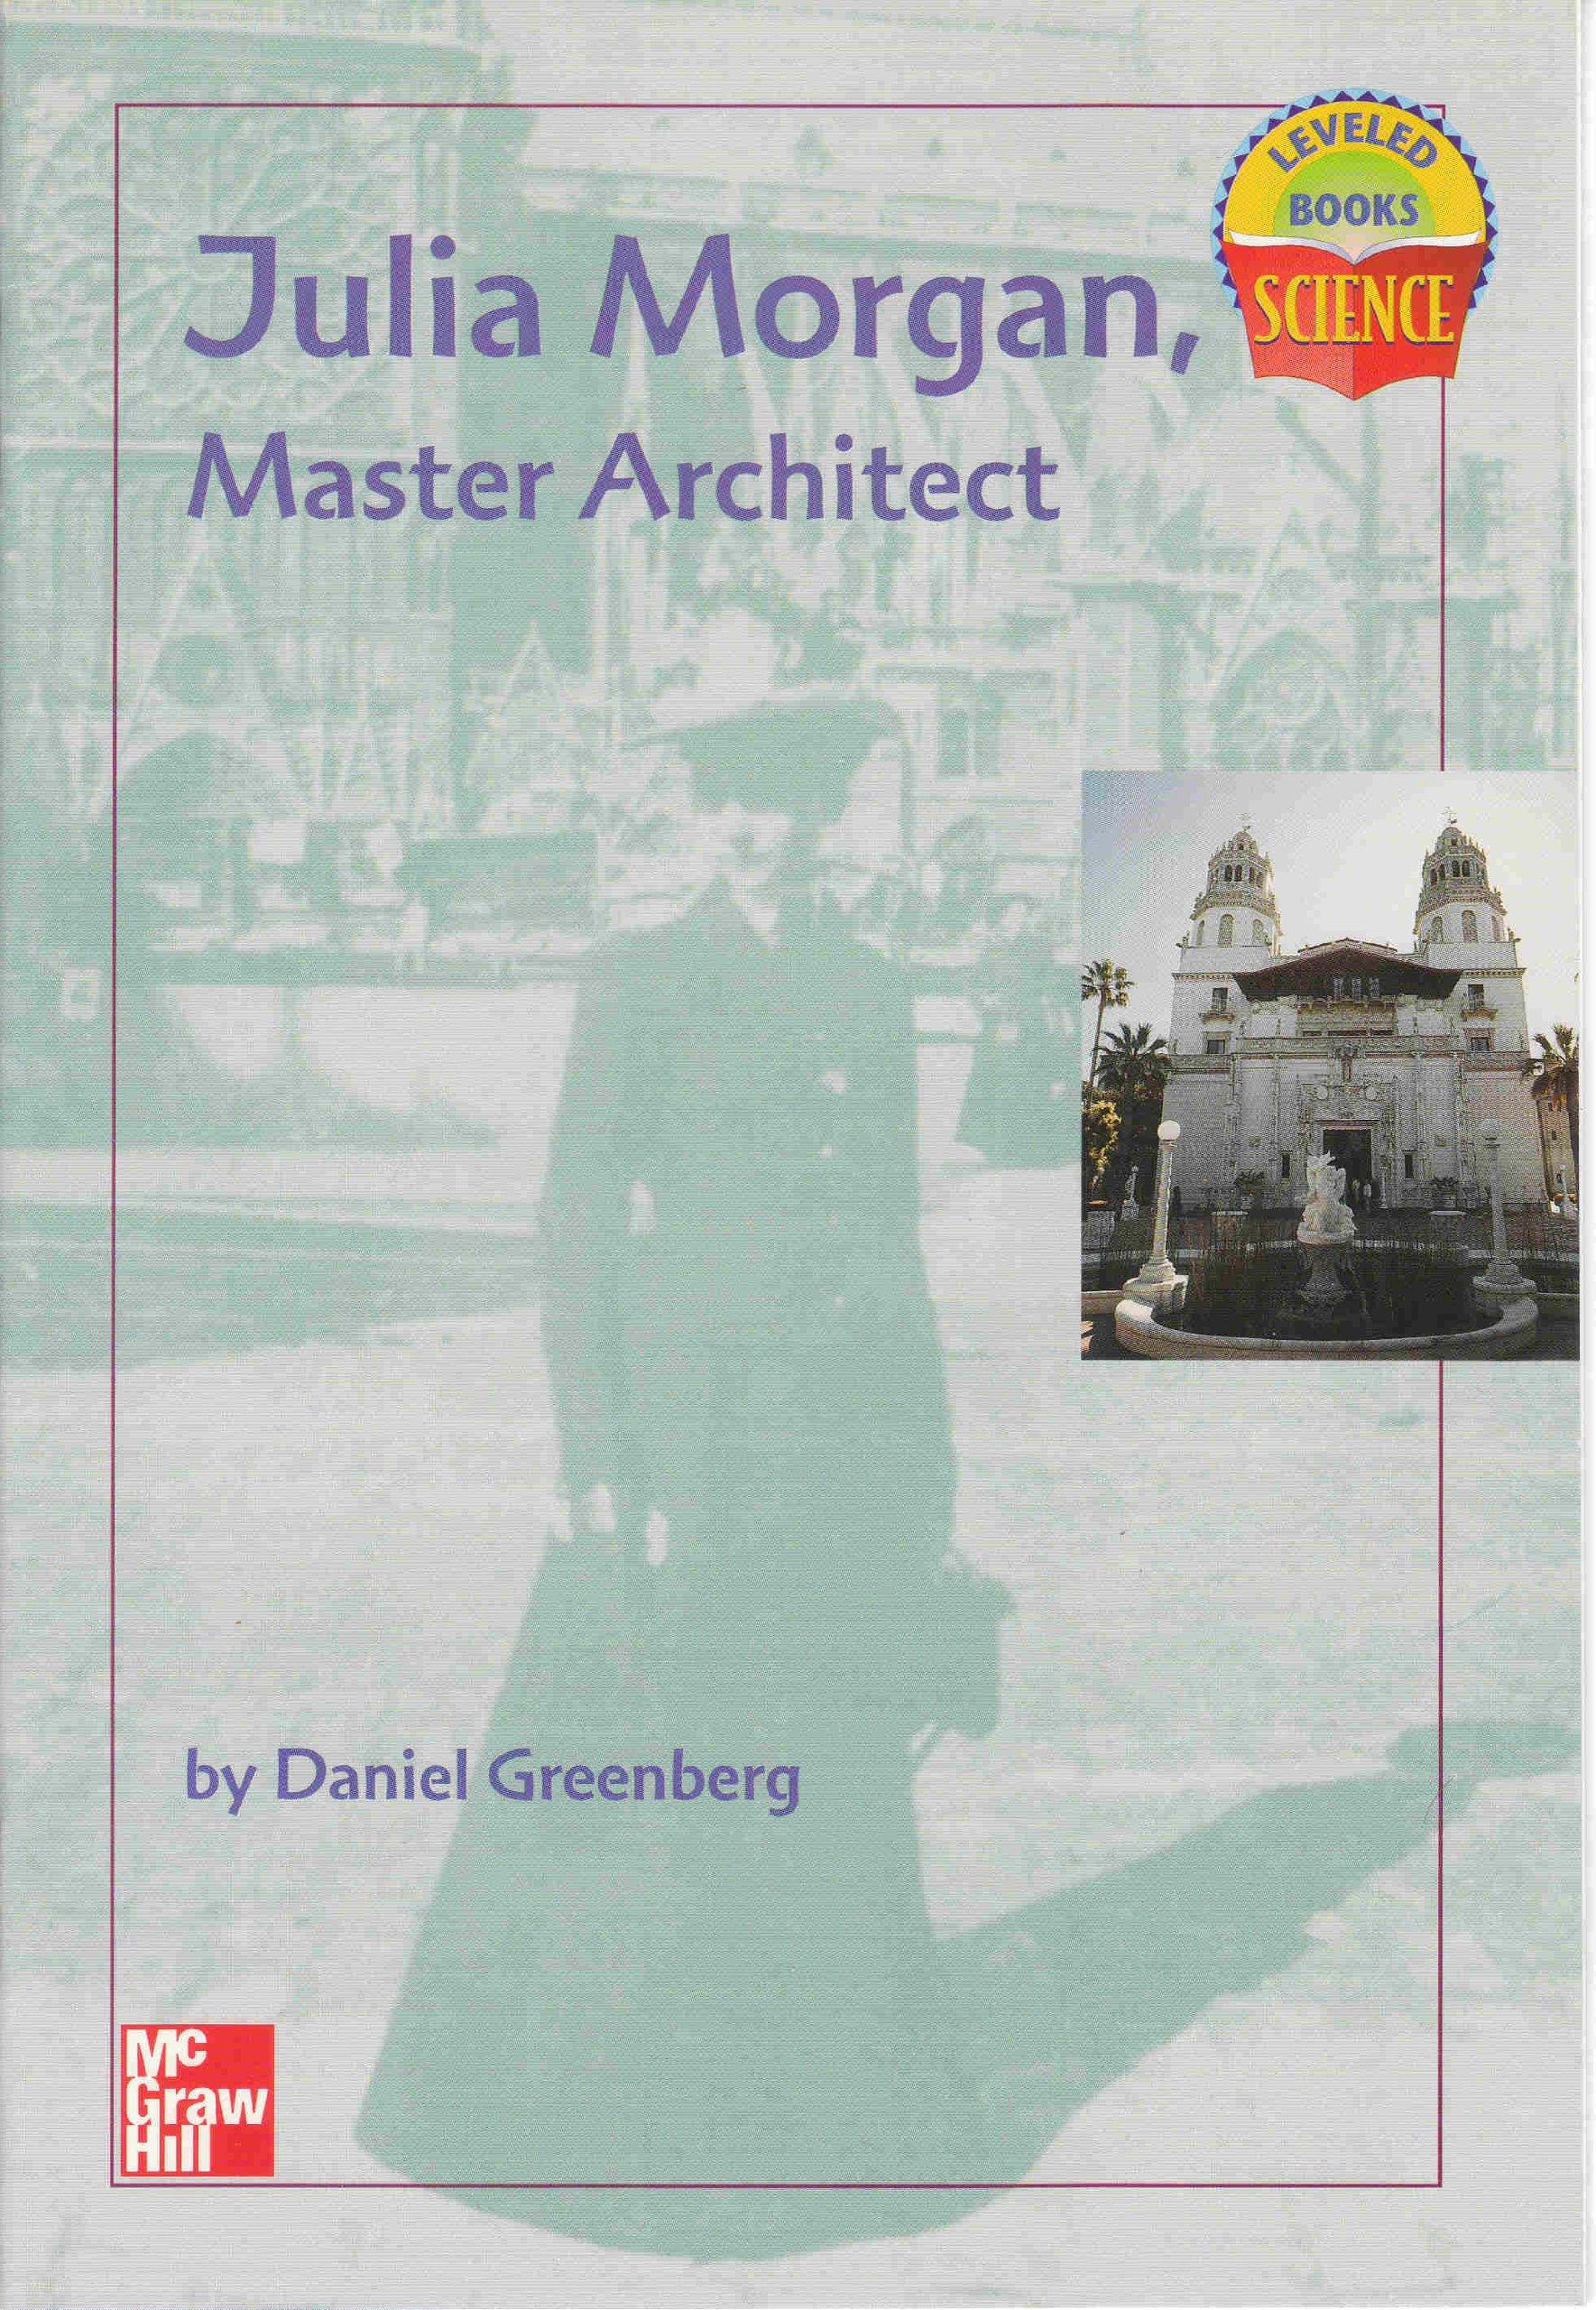 Download Julia Morgan Master Architect (4) (Leveled Books - Science) pdf epub